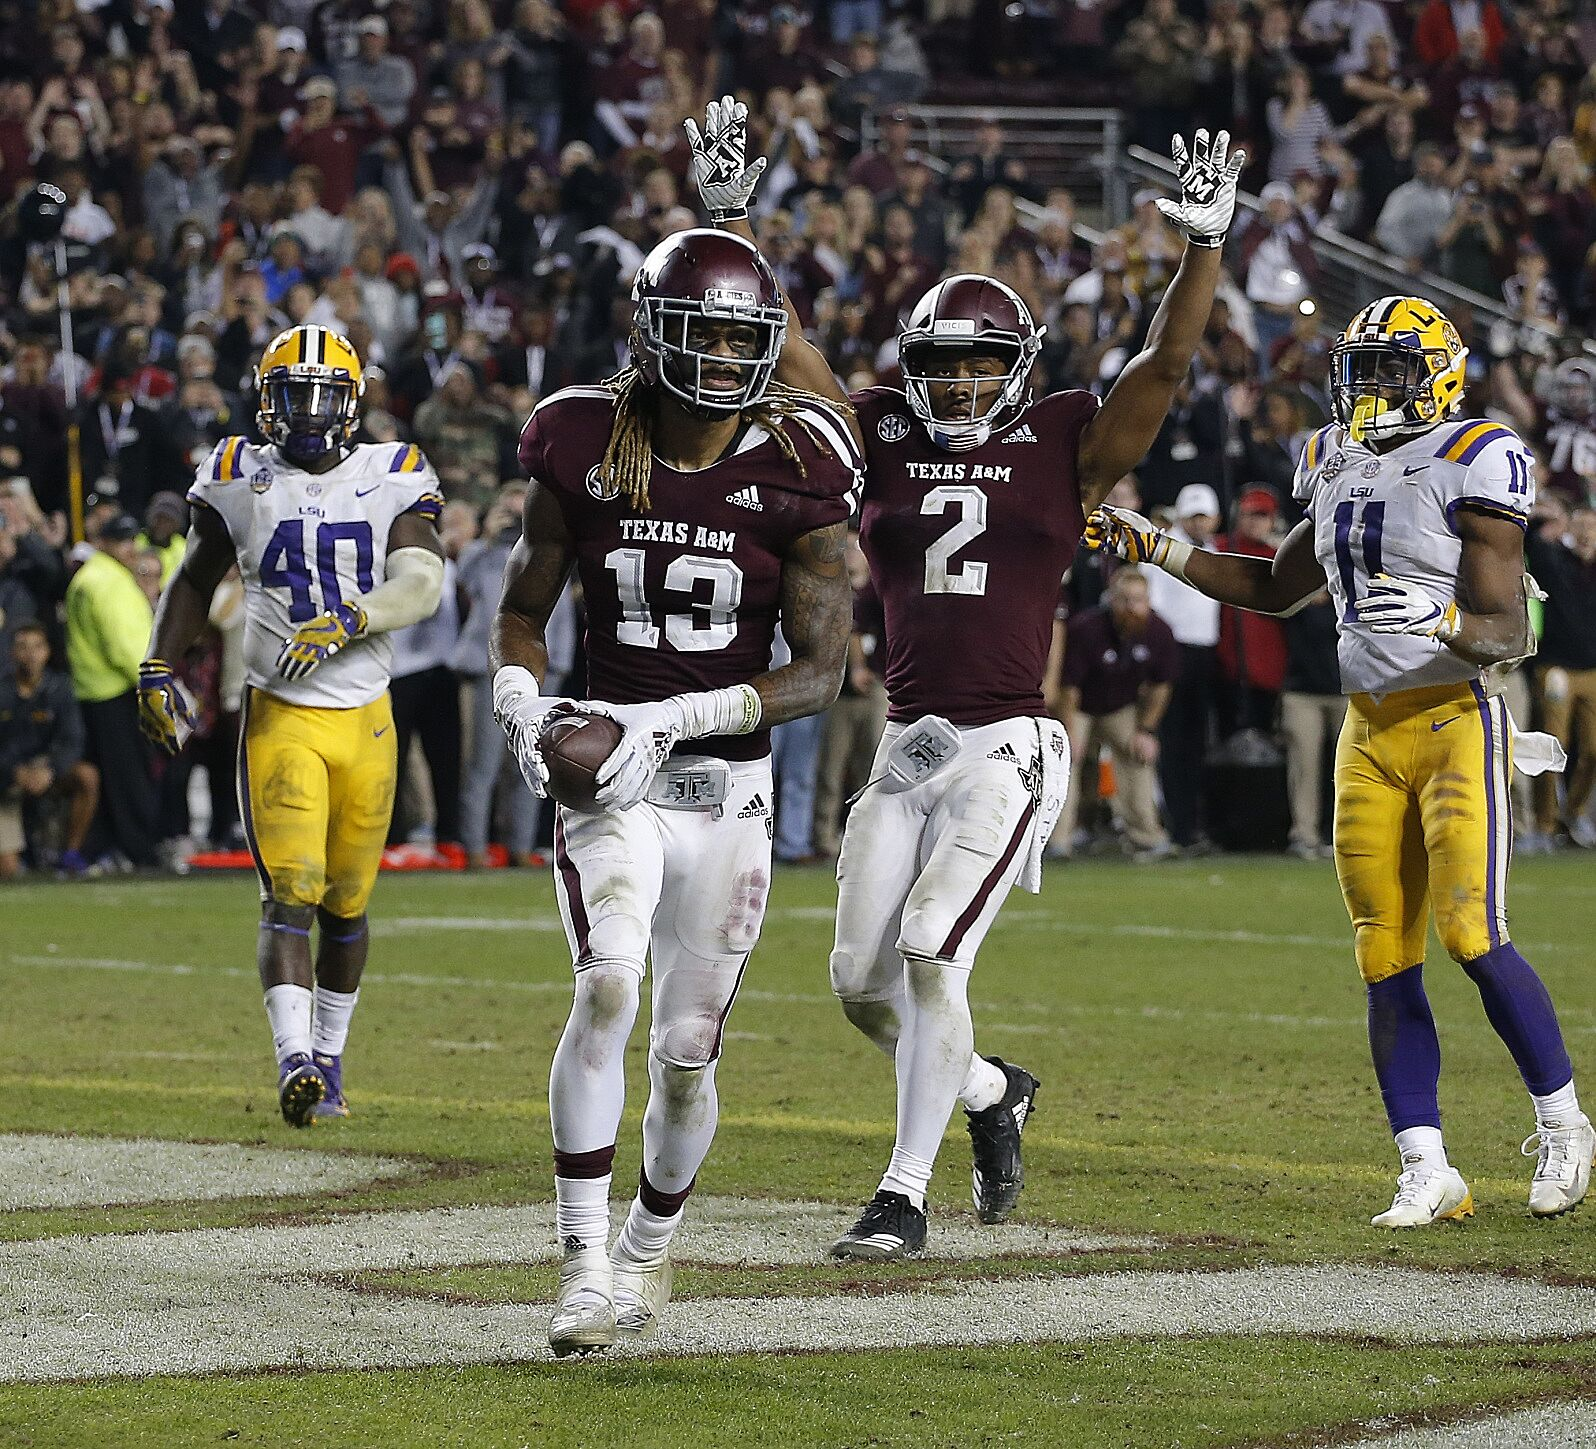 College Football 2018: 5 takeaways from Week 13 - Page 6